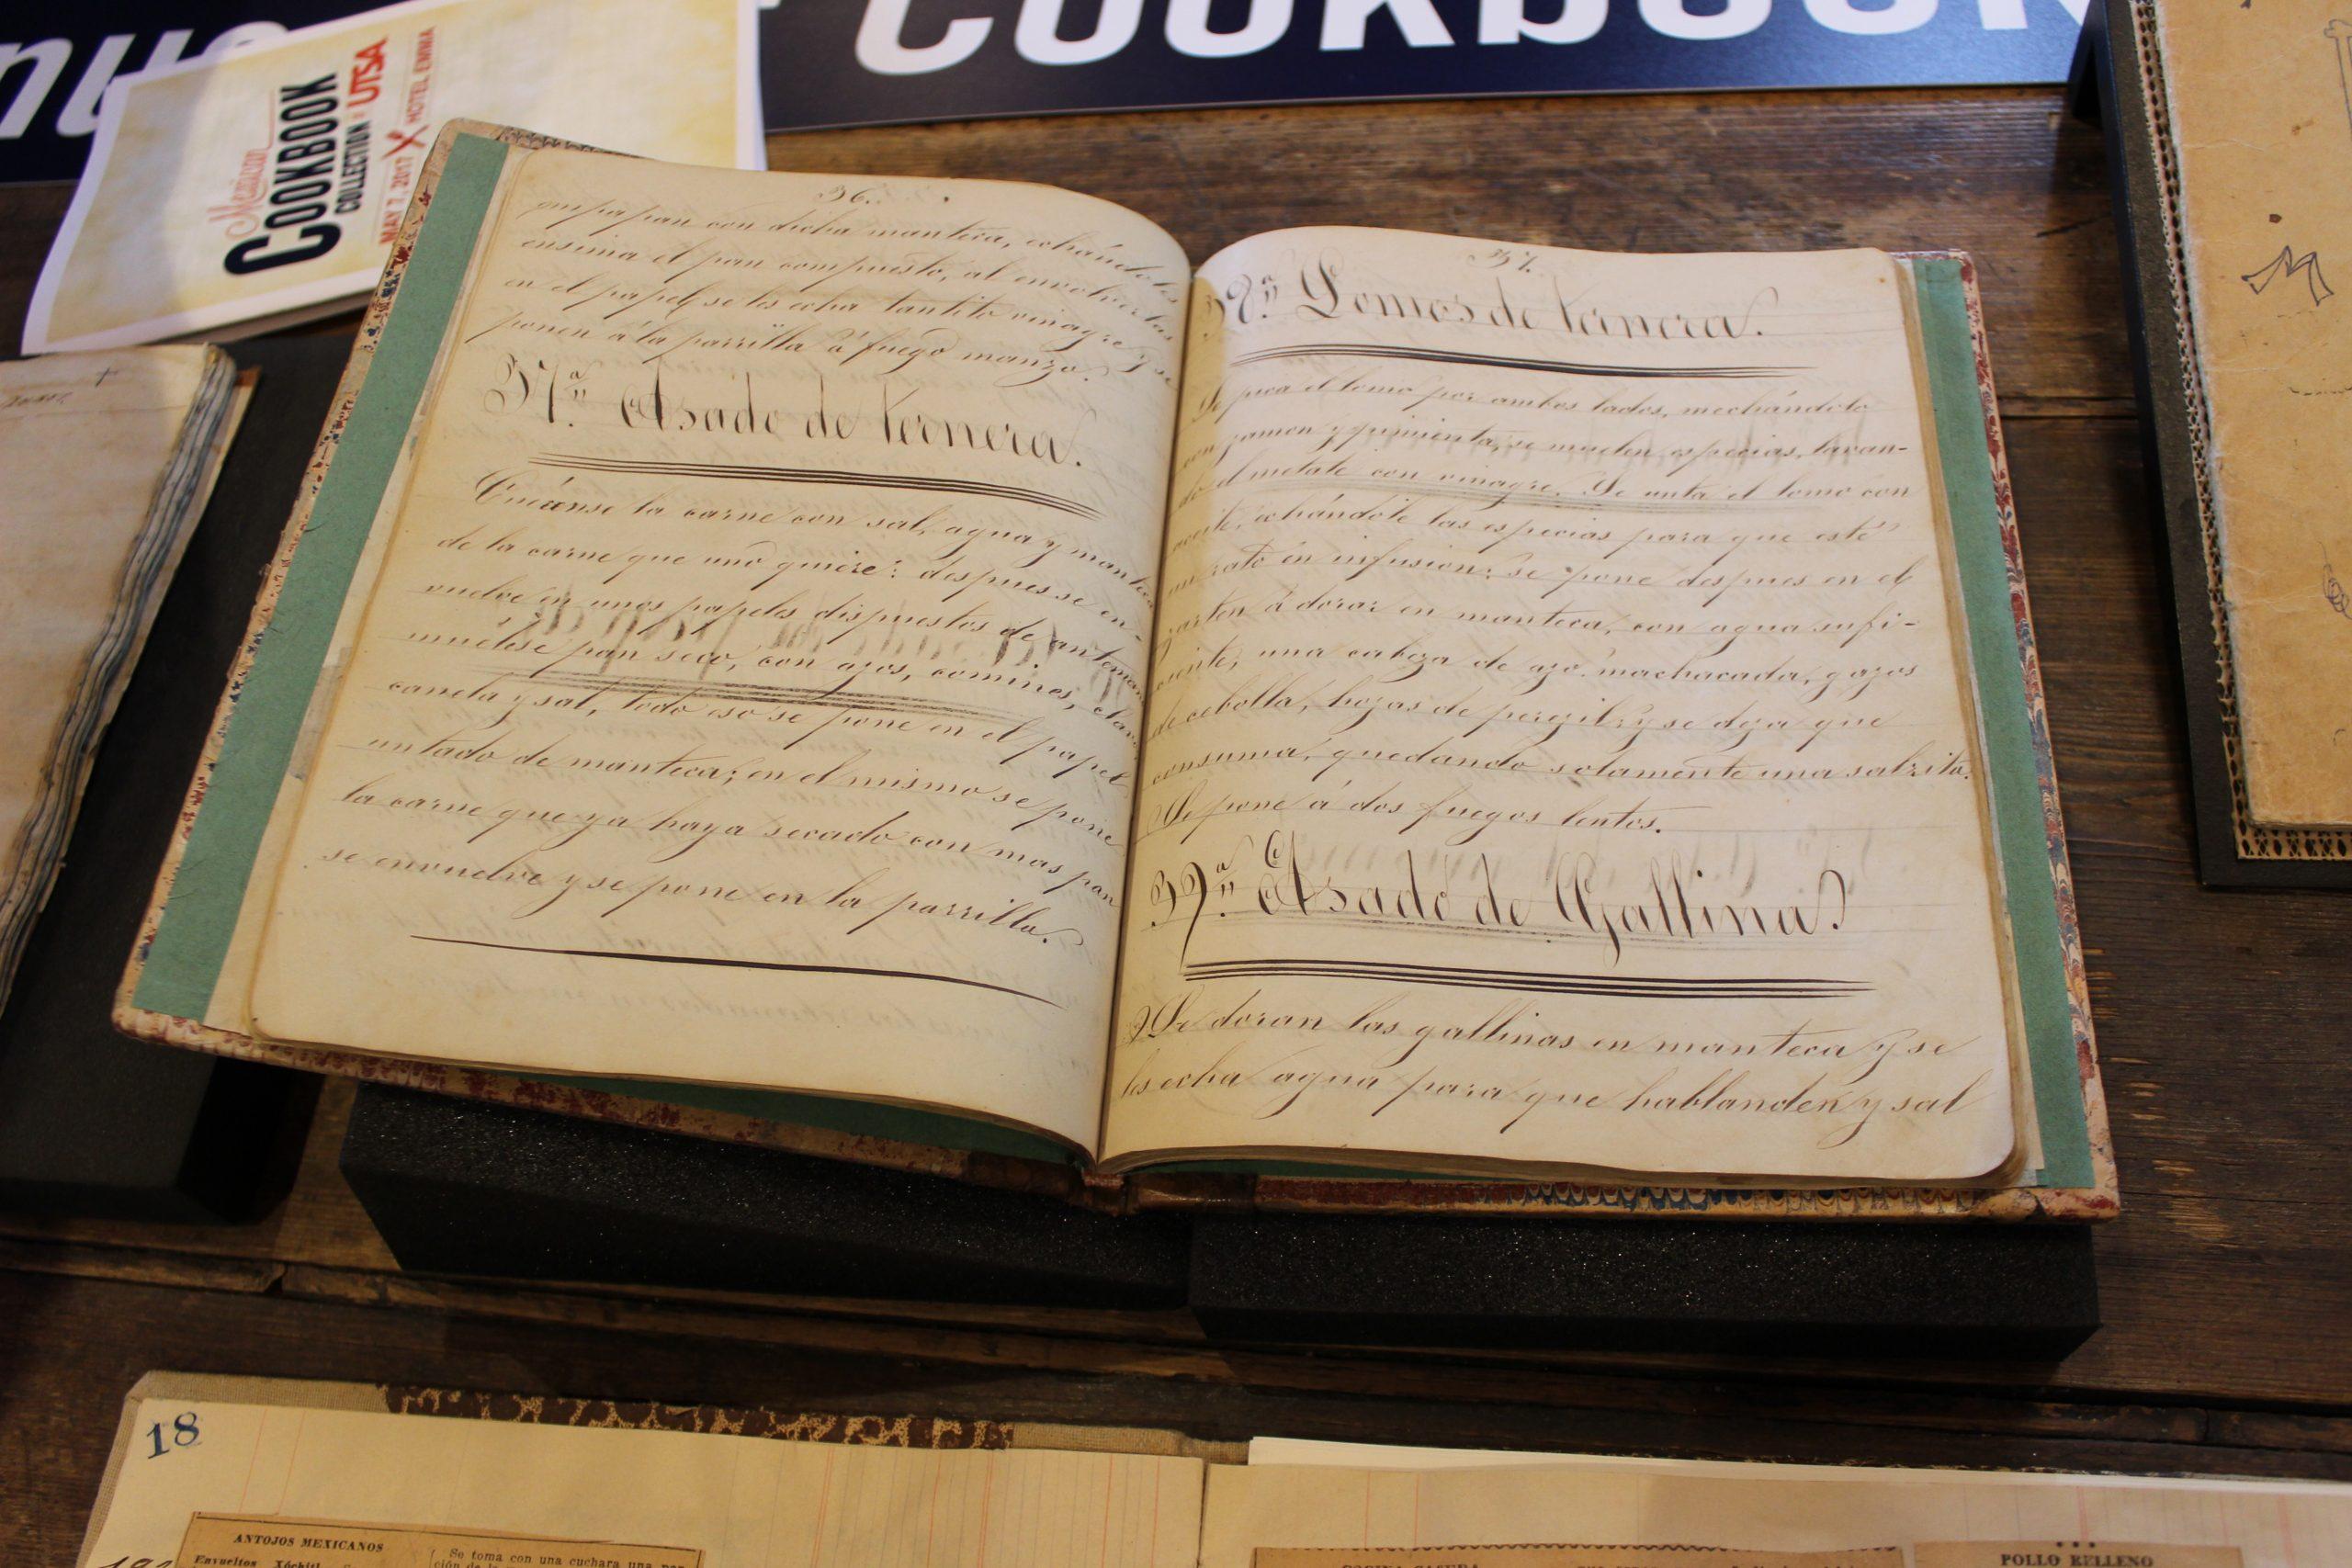 Many older cookbooks were handwritten in repurposed notebooks